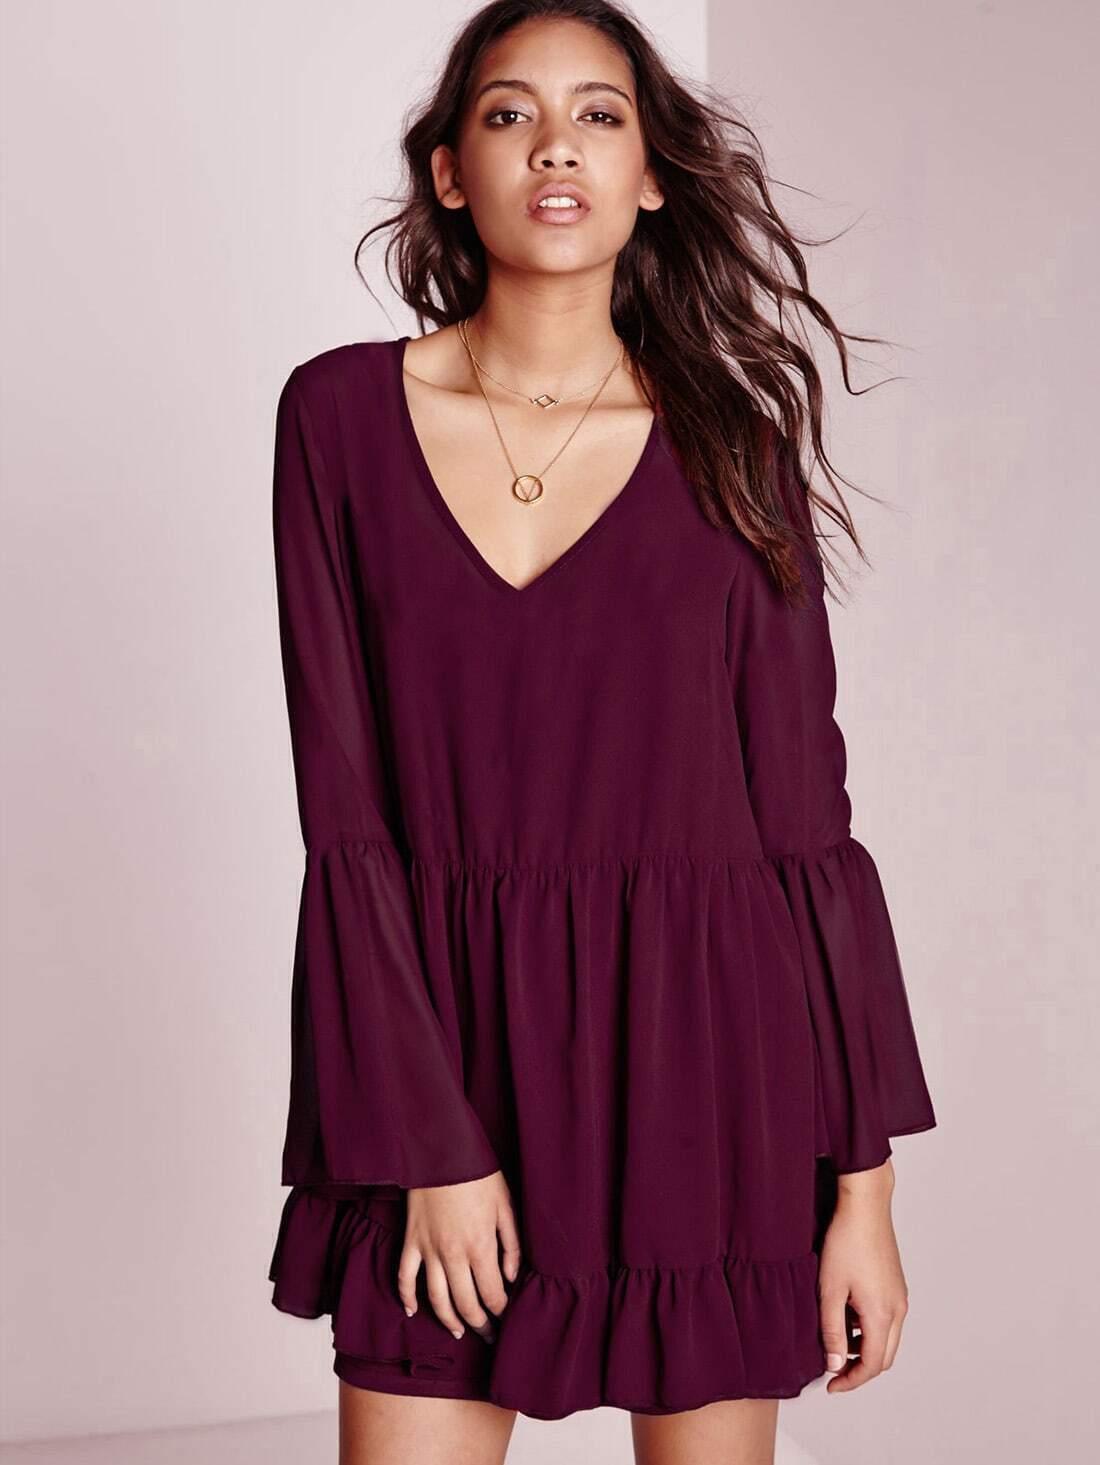 2b3549e917 Burgundy Long Sleeve Ruffle Dress EmmaCloth-Women Fast Fashion Online